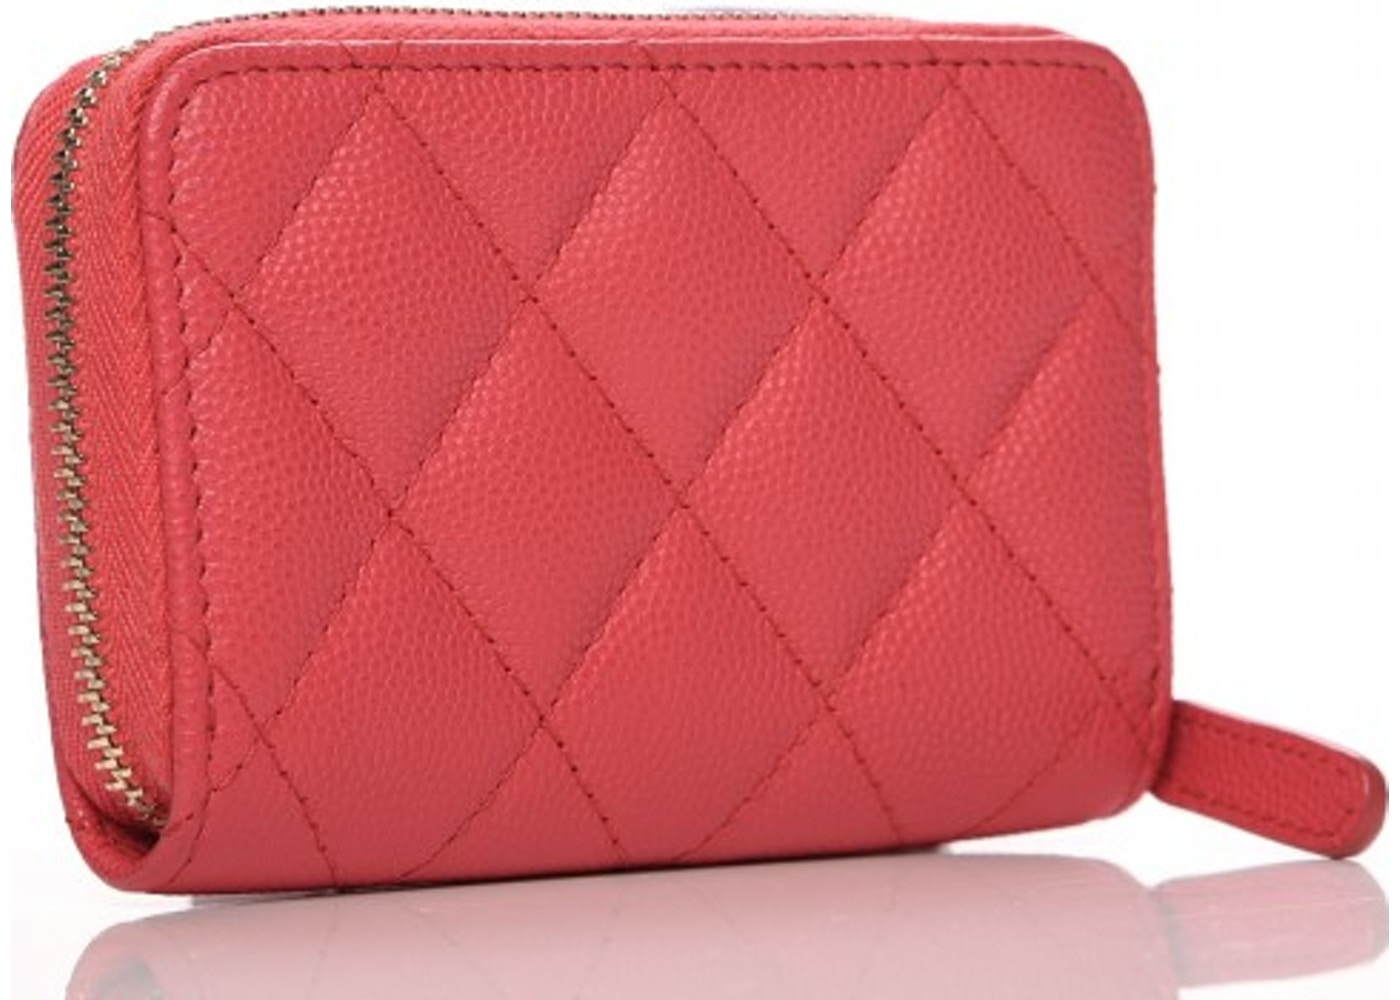 3b10fa8815fe Chanel Zip Around Coin Purse Diamond Quilted Dark Pink